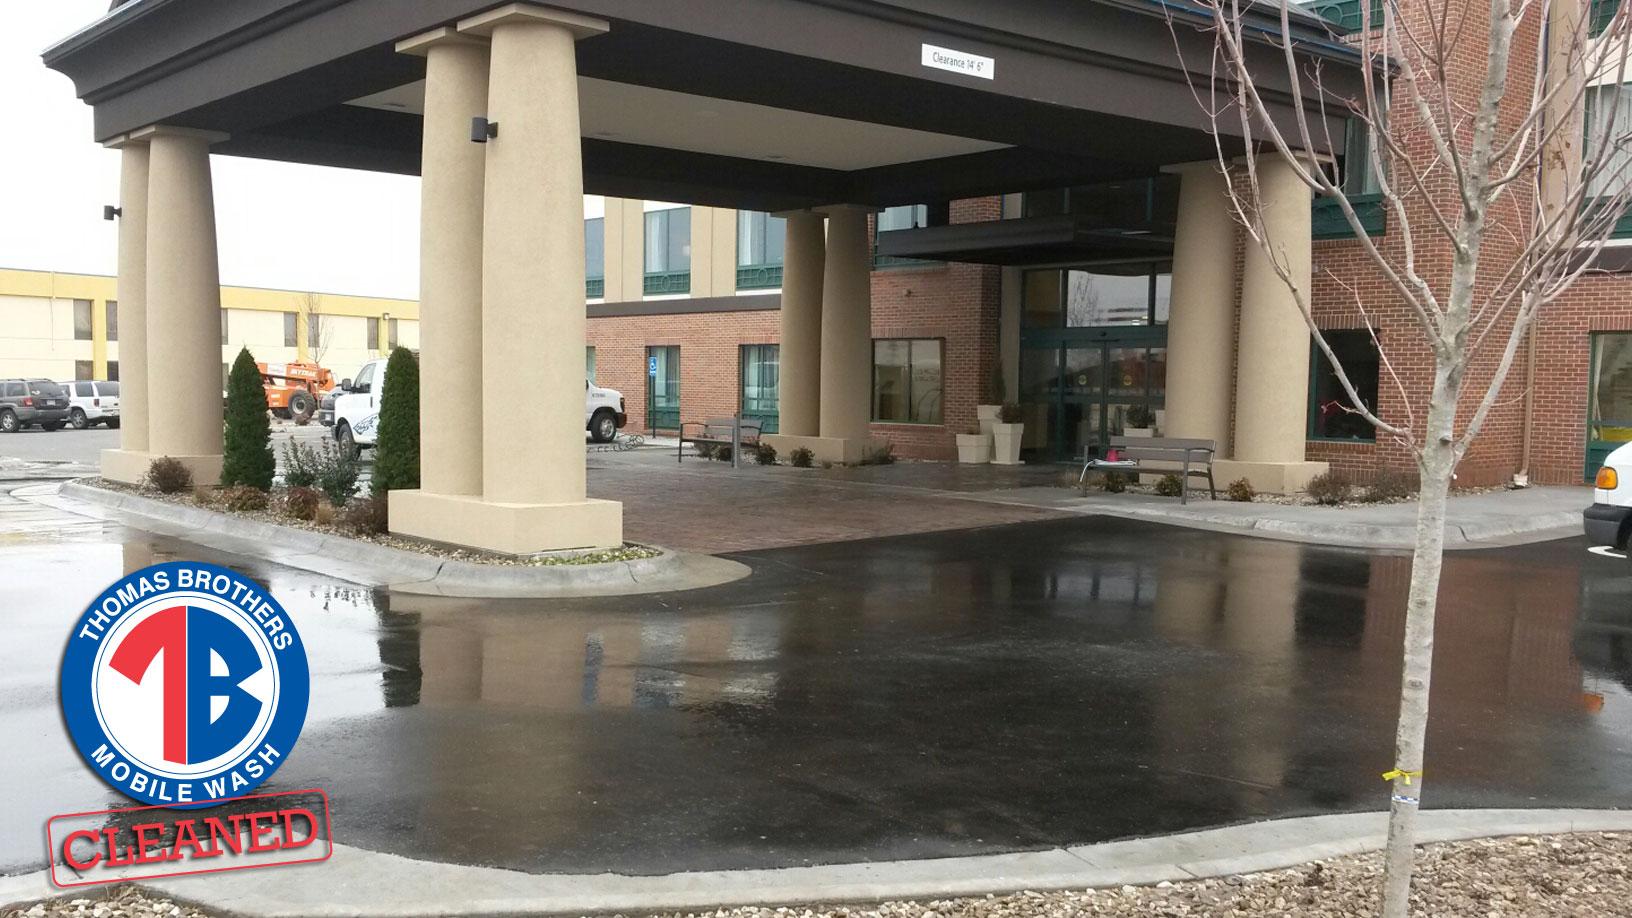 Power washing business parking lot in Kansas - Thomas Brothers Mobile Wash